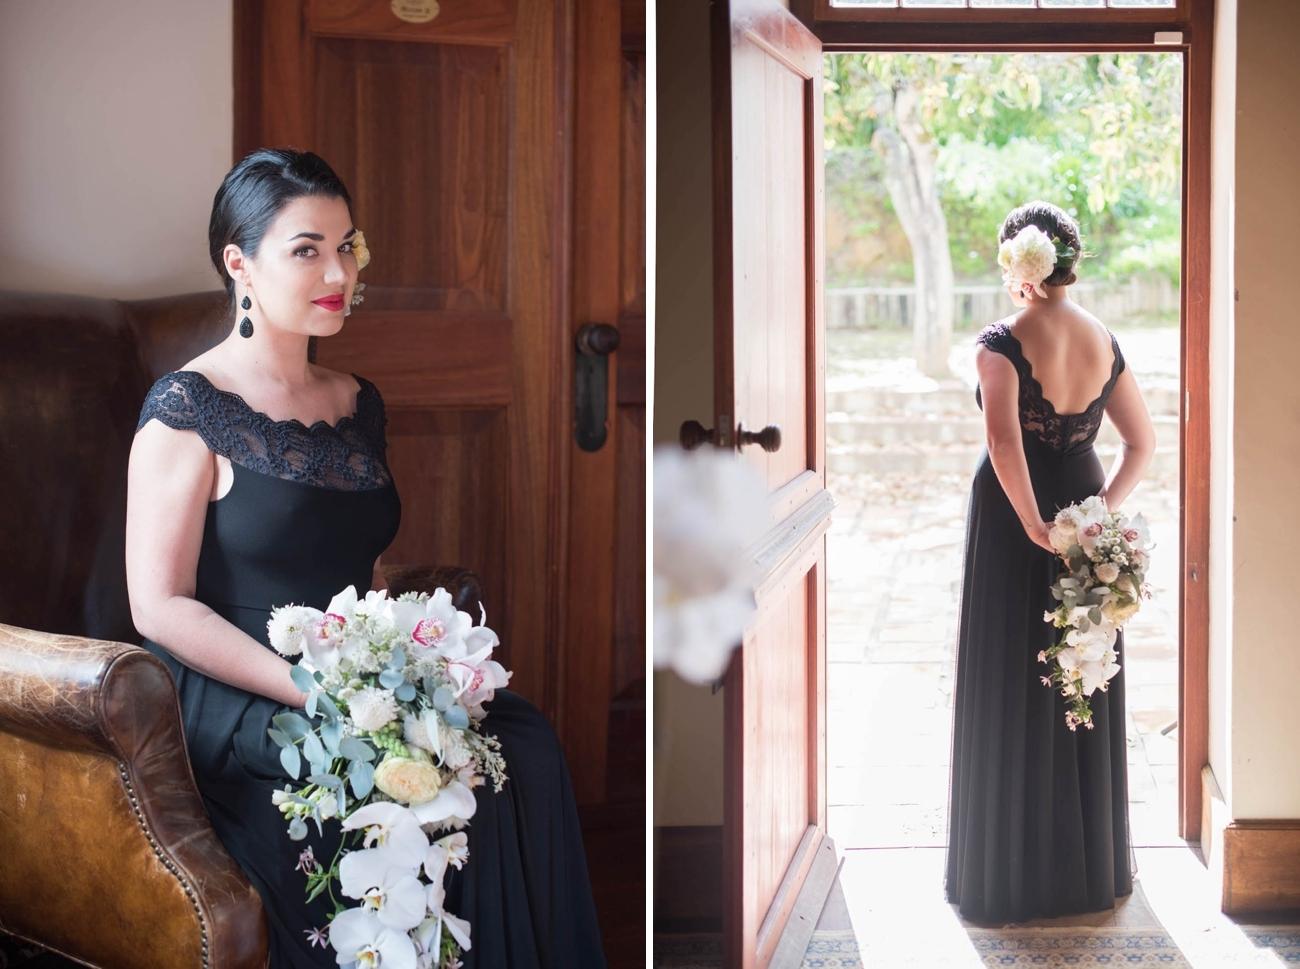 Spanish Flamenco Wedding Inspiration | Credit: Jacoba Clothing/Forever September